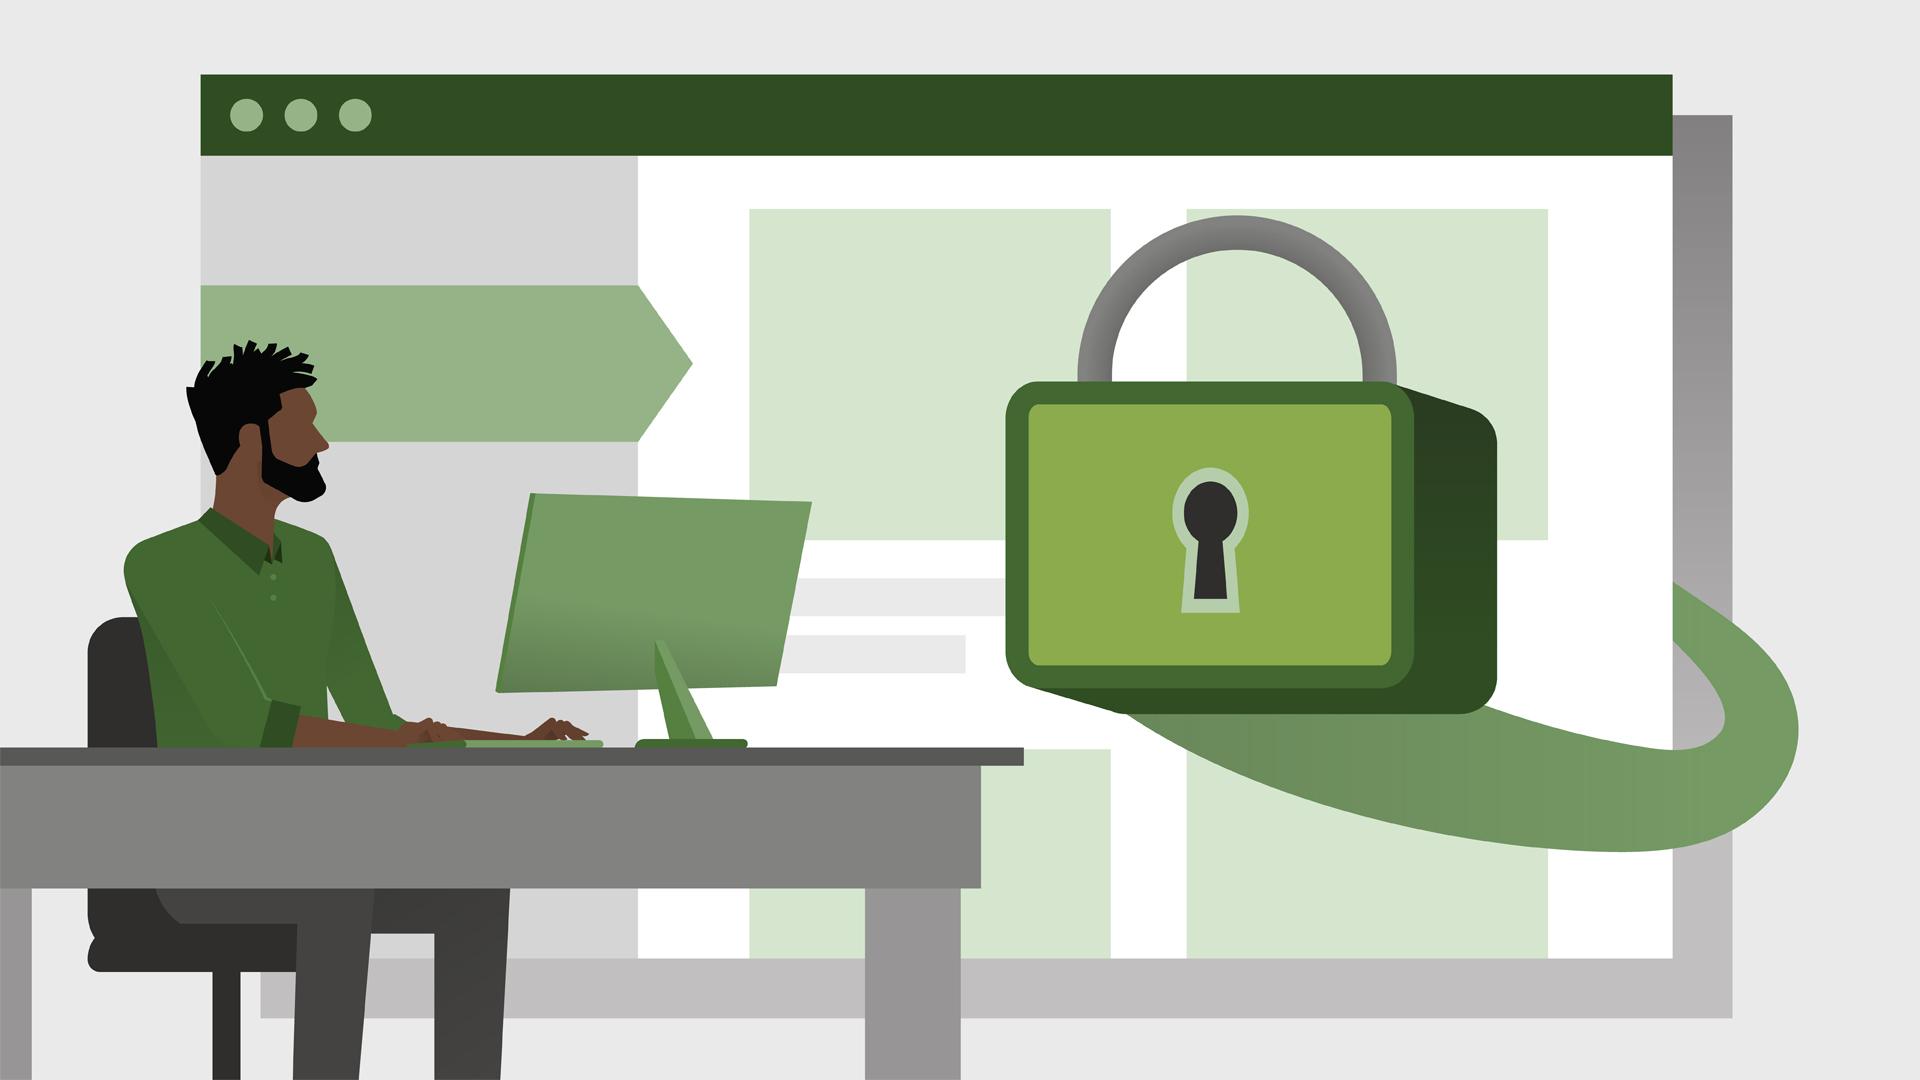 WordPress: Developing Secure Sites